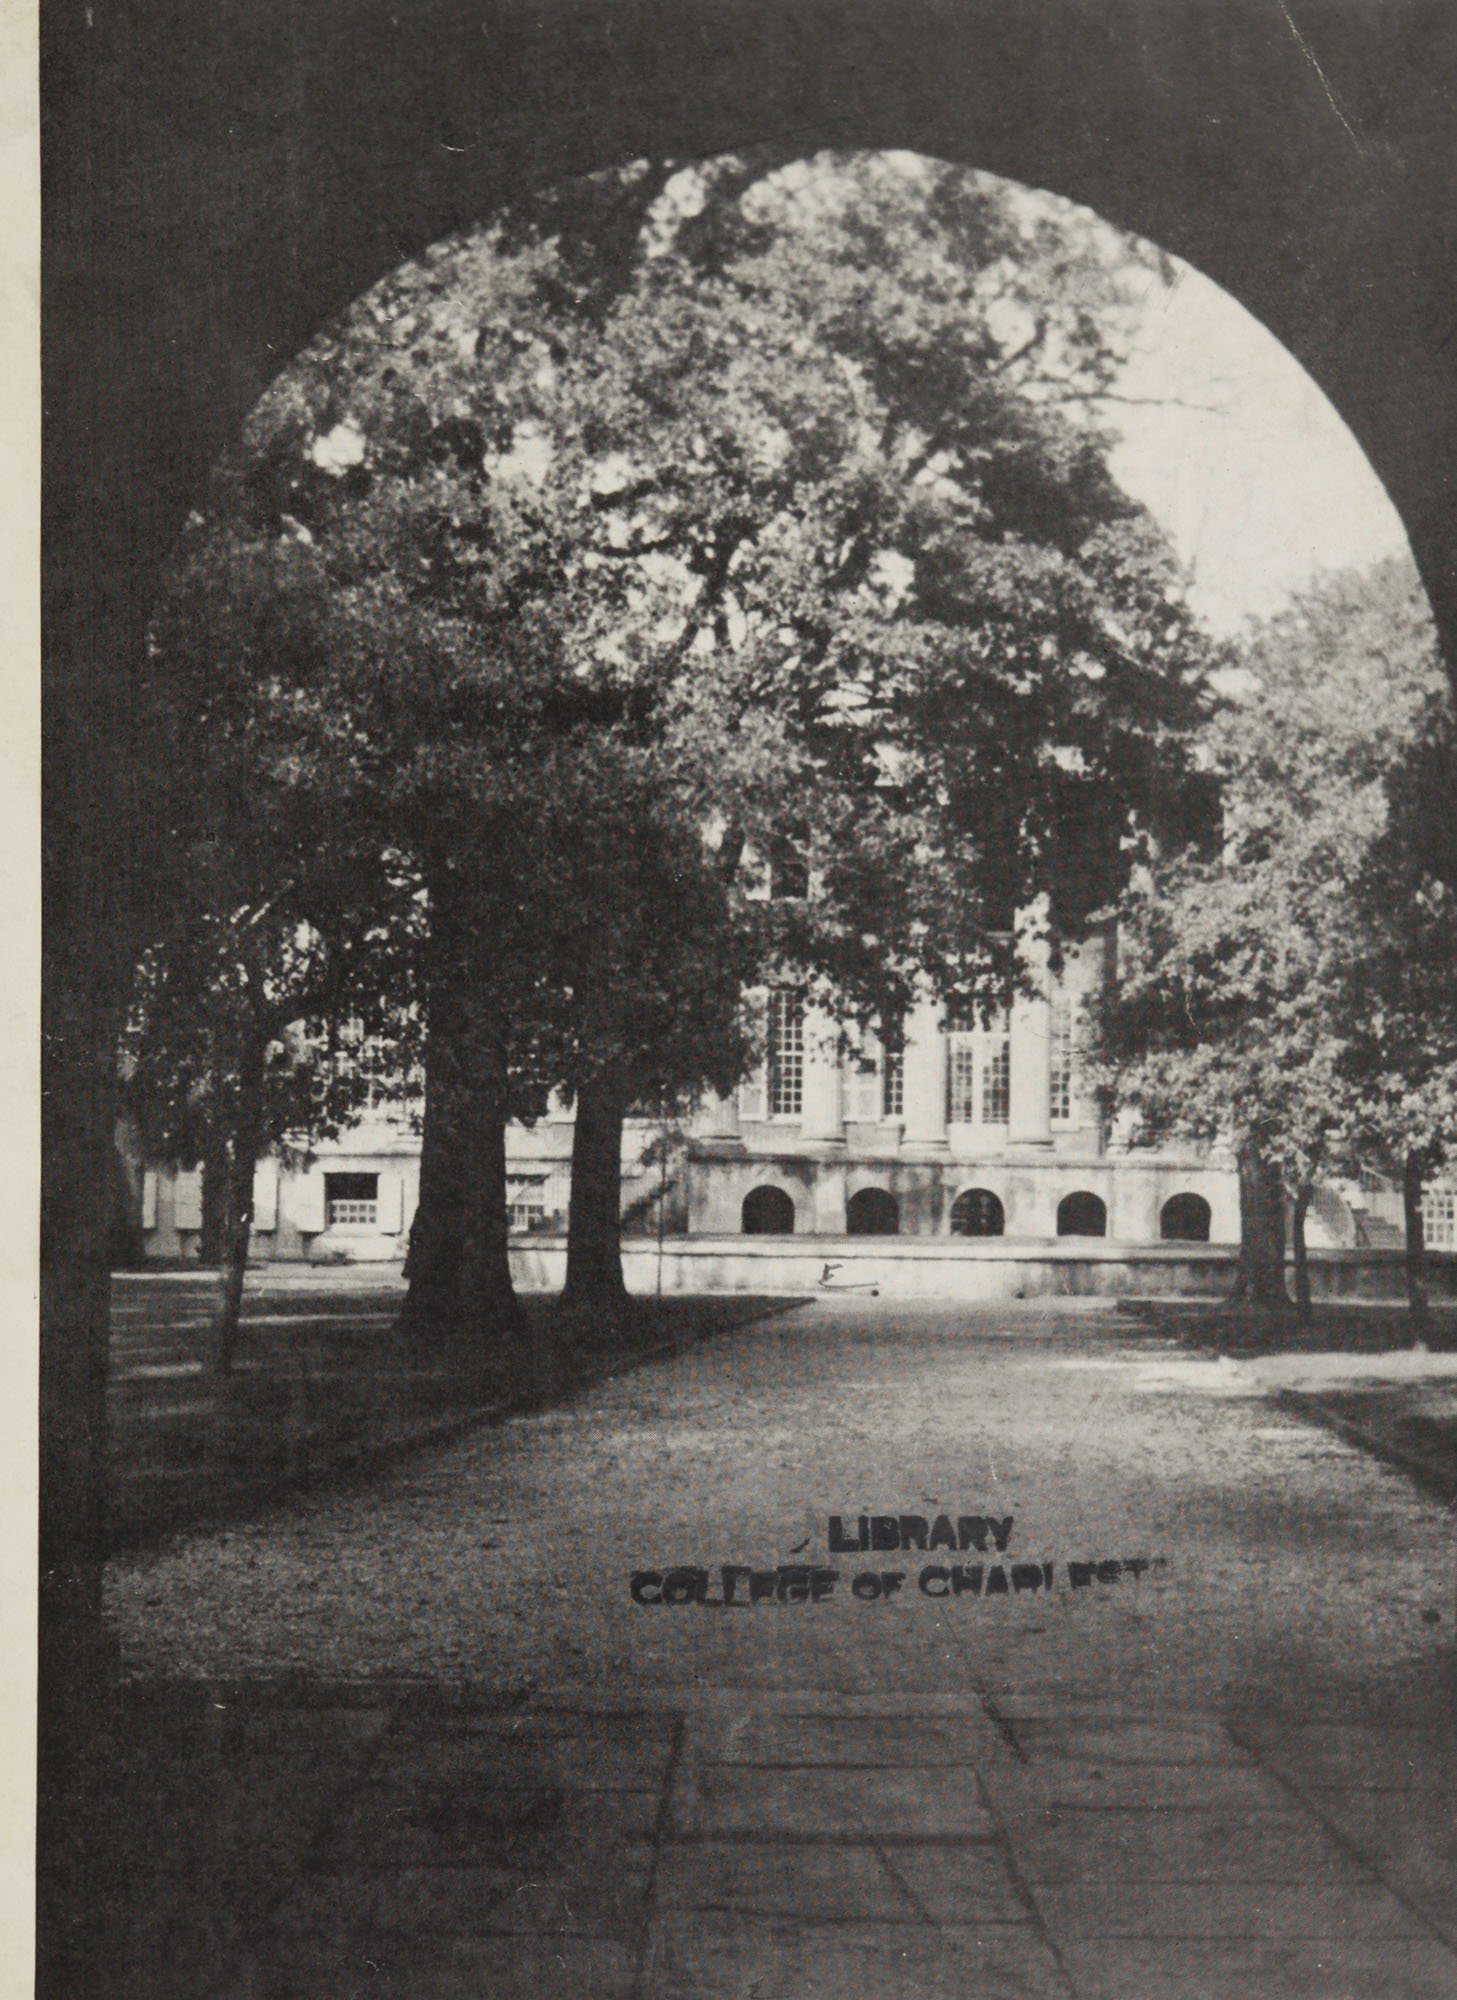 College of Charleston Magazine, 1937-1938, Vol. XXXXI No. 1, cover